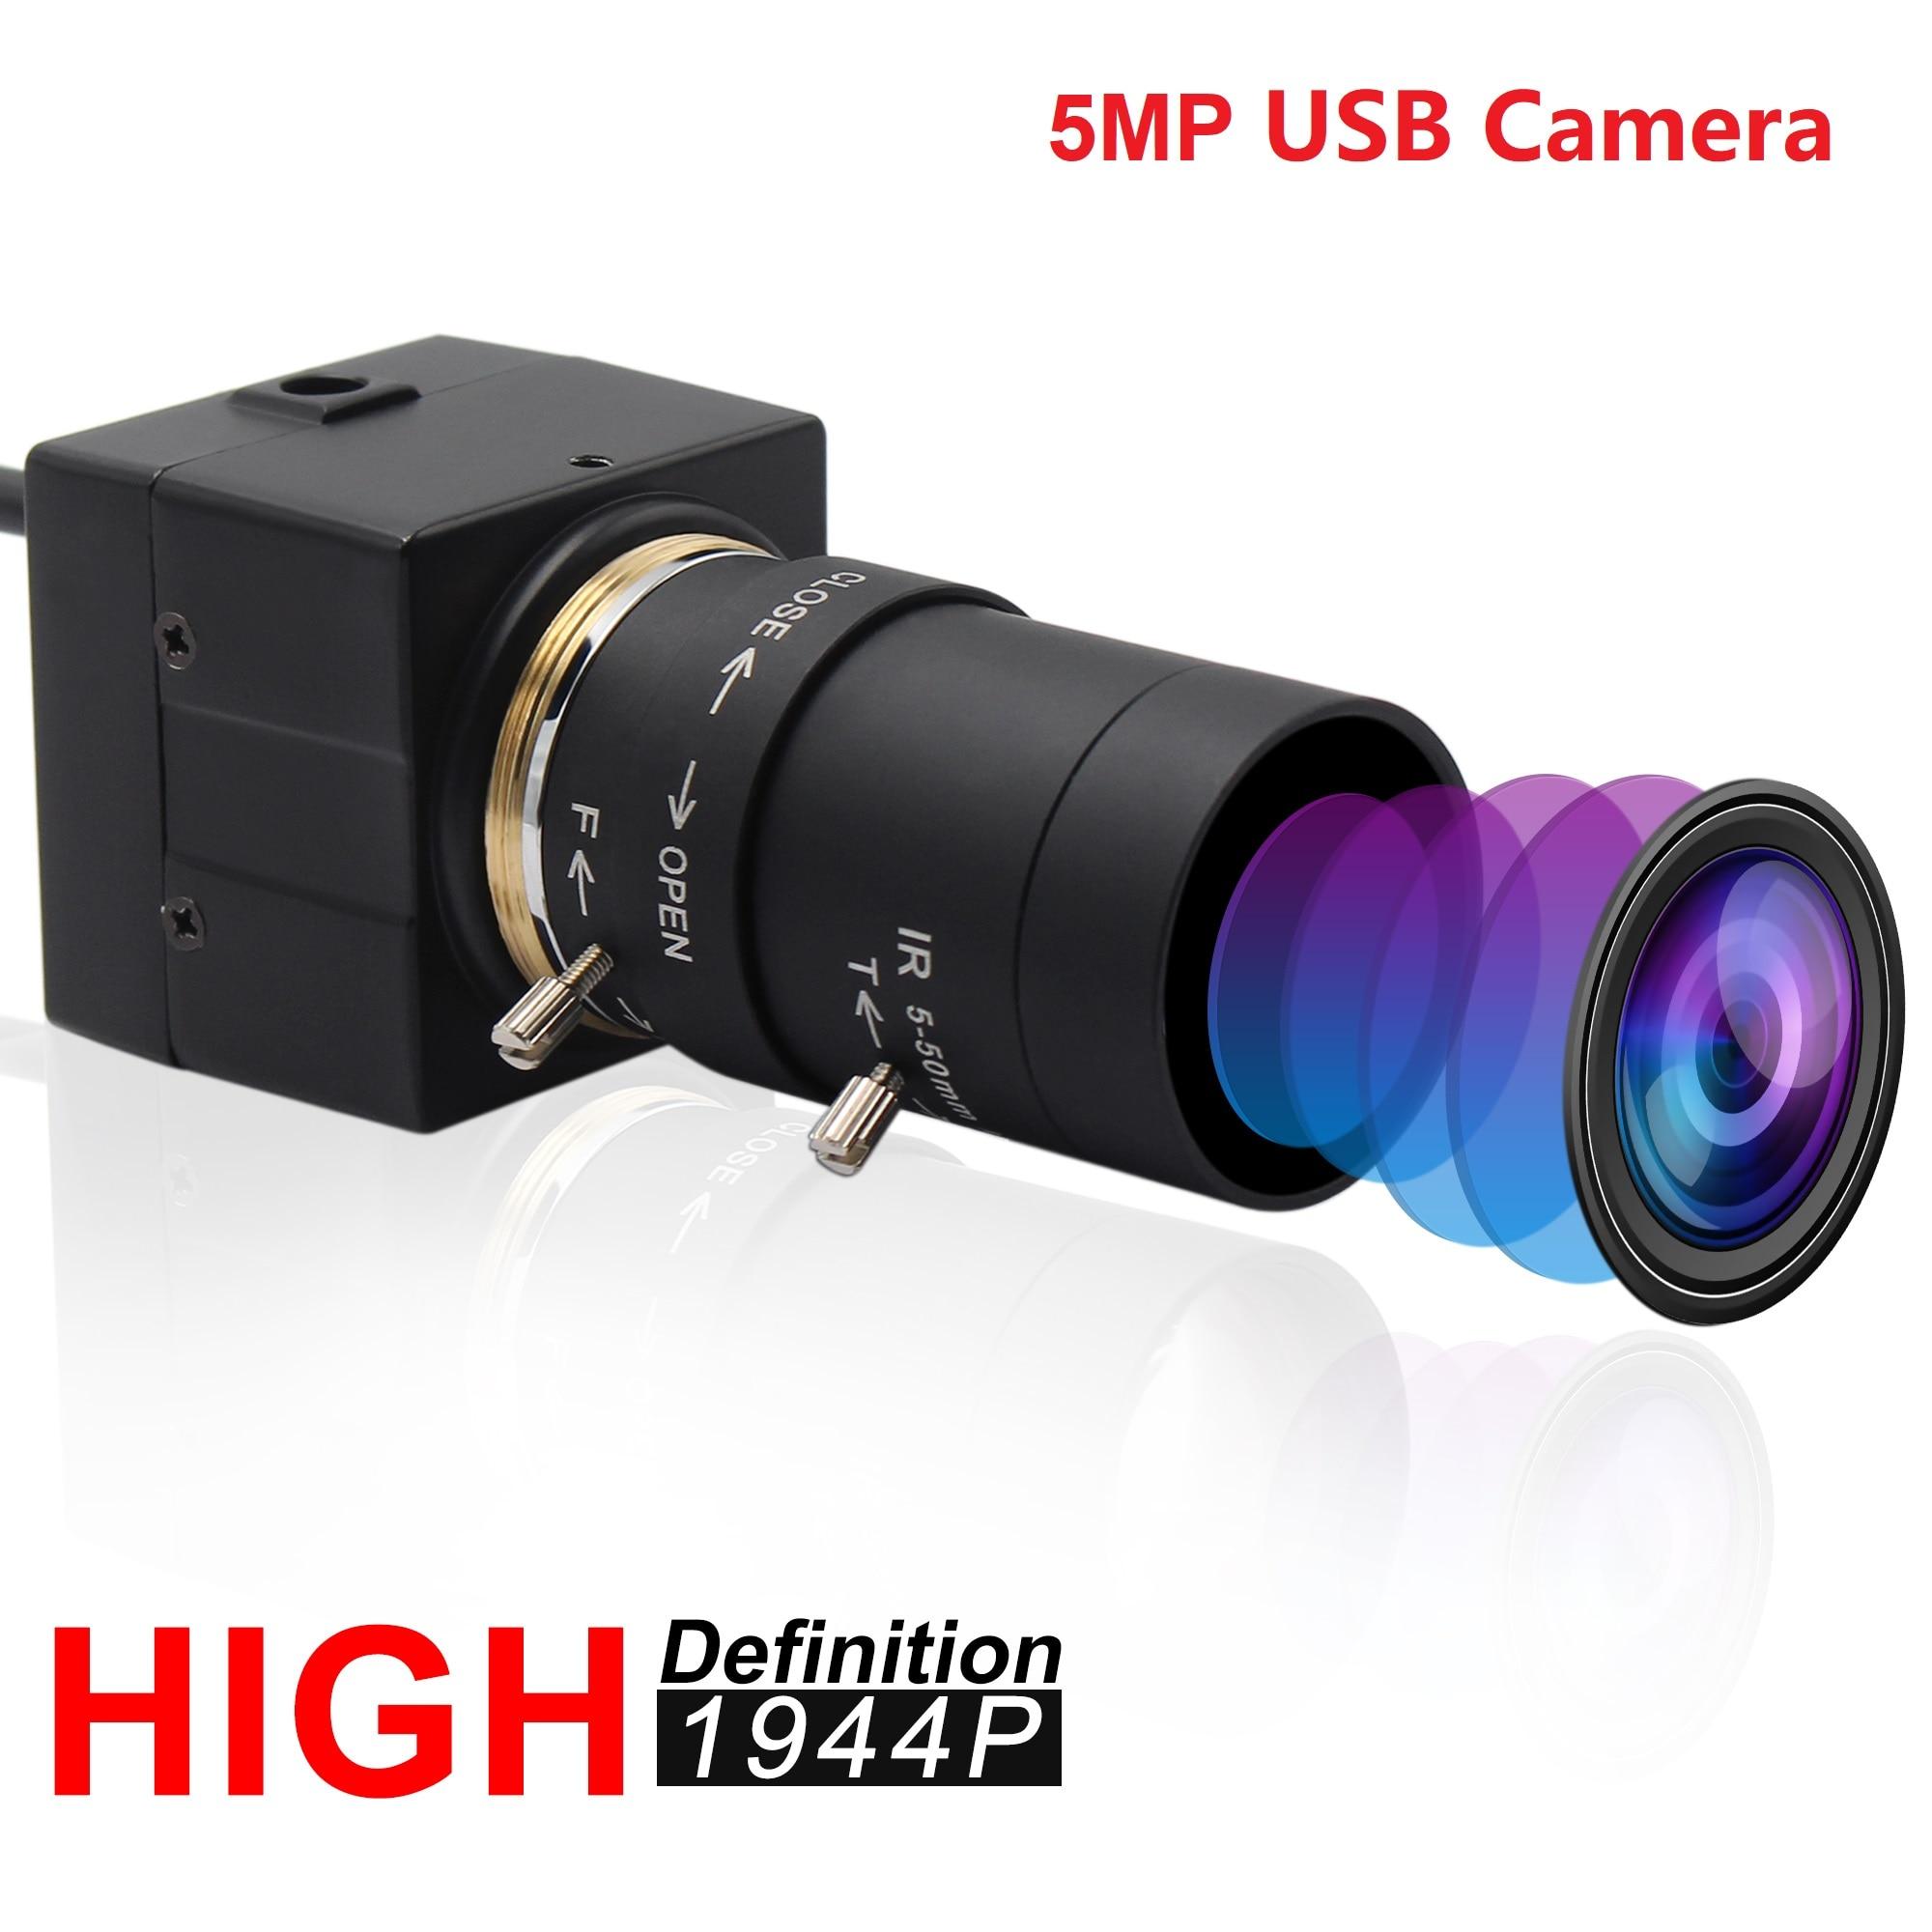 5 Megapixel 2592*1944 OV5640 Camera Manual Zoom Varifocal USB Camera 5MP Video Security Webcam For Linux Android Windows MAC